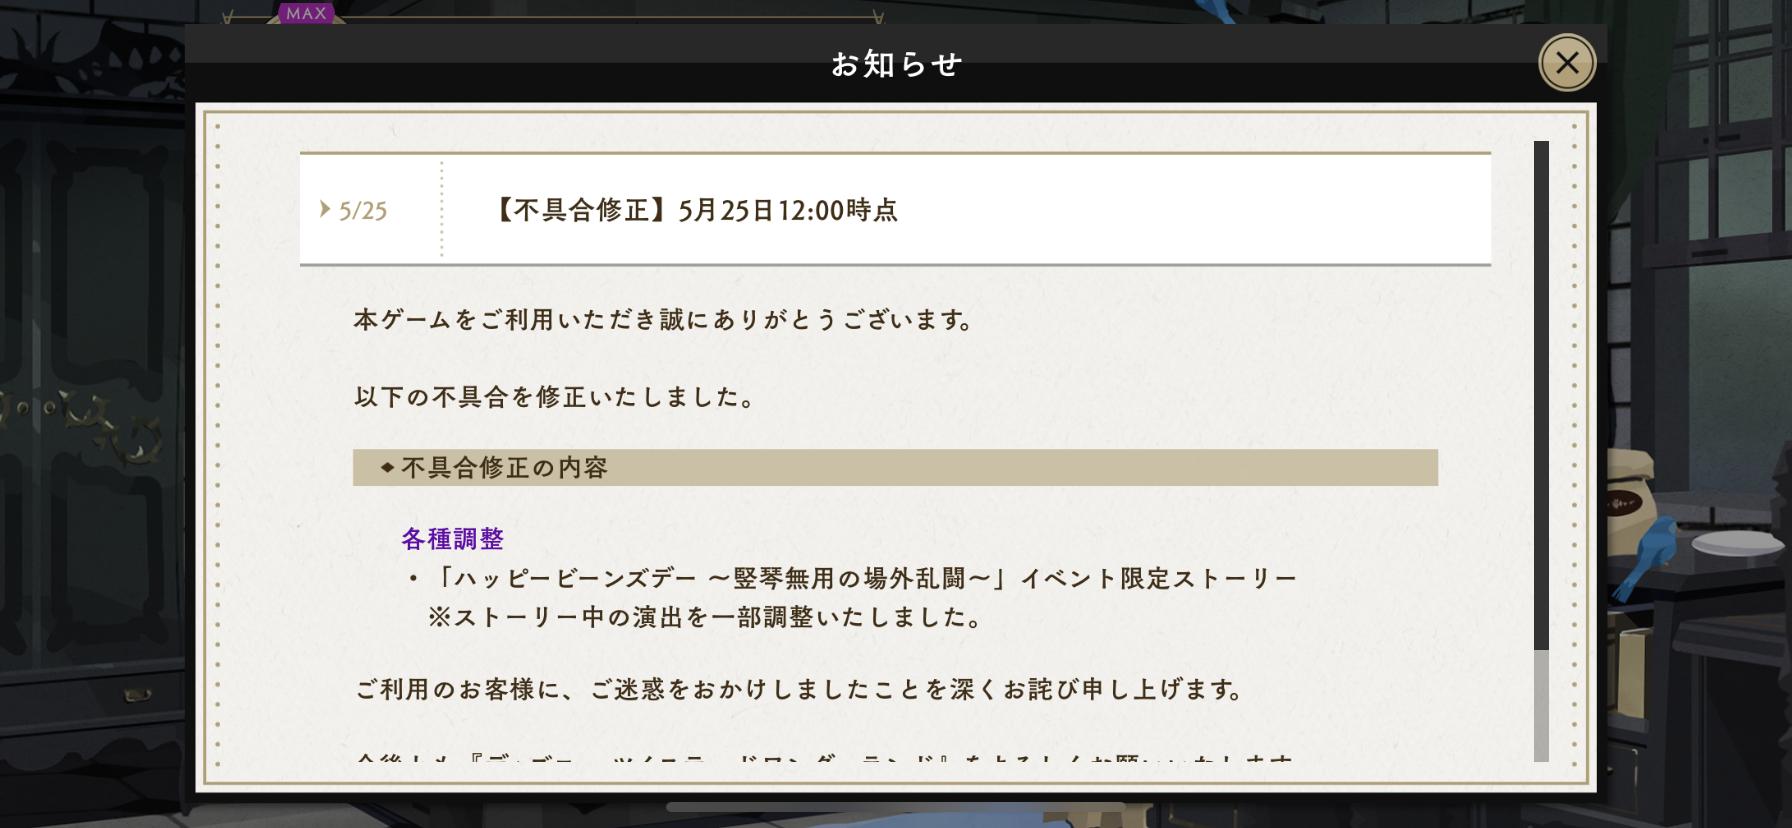 f:id:motimoti444:20210525183752p:plain